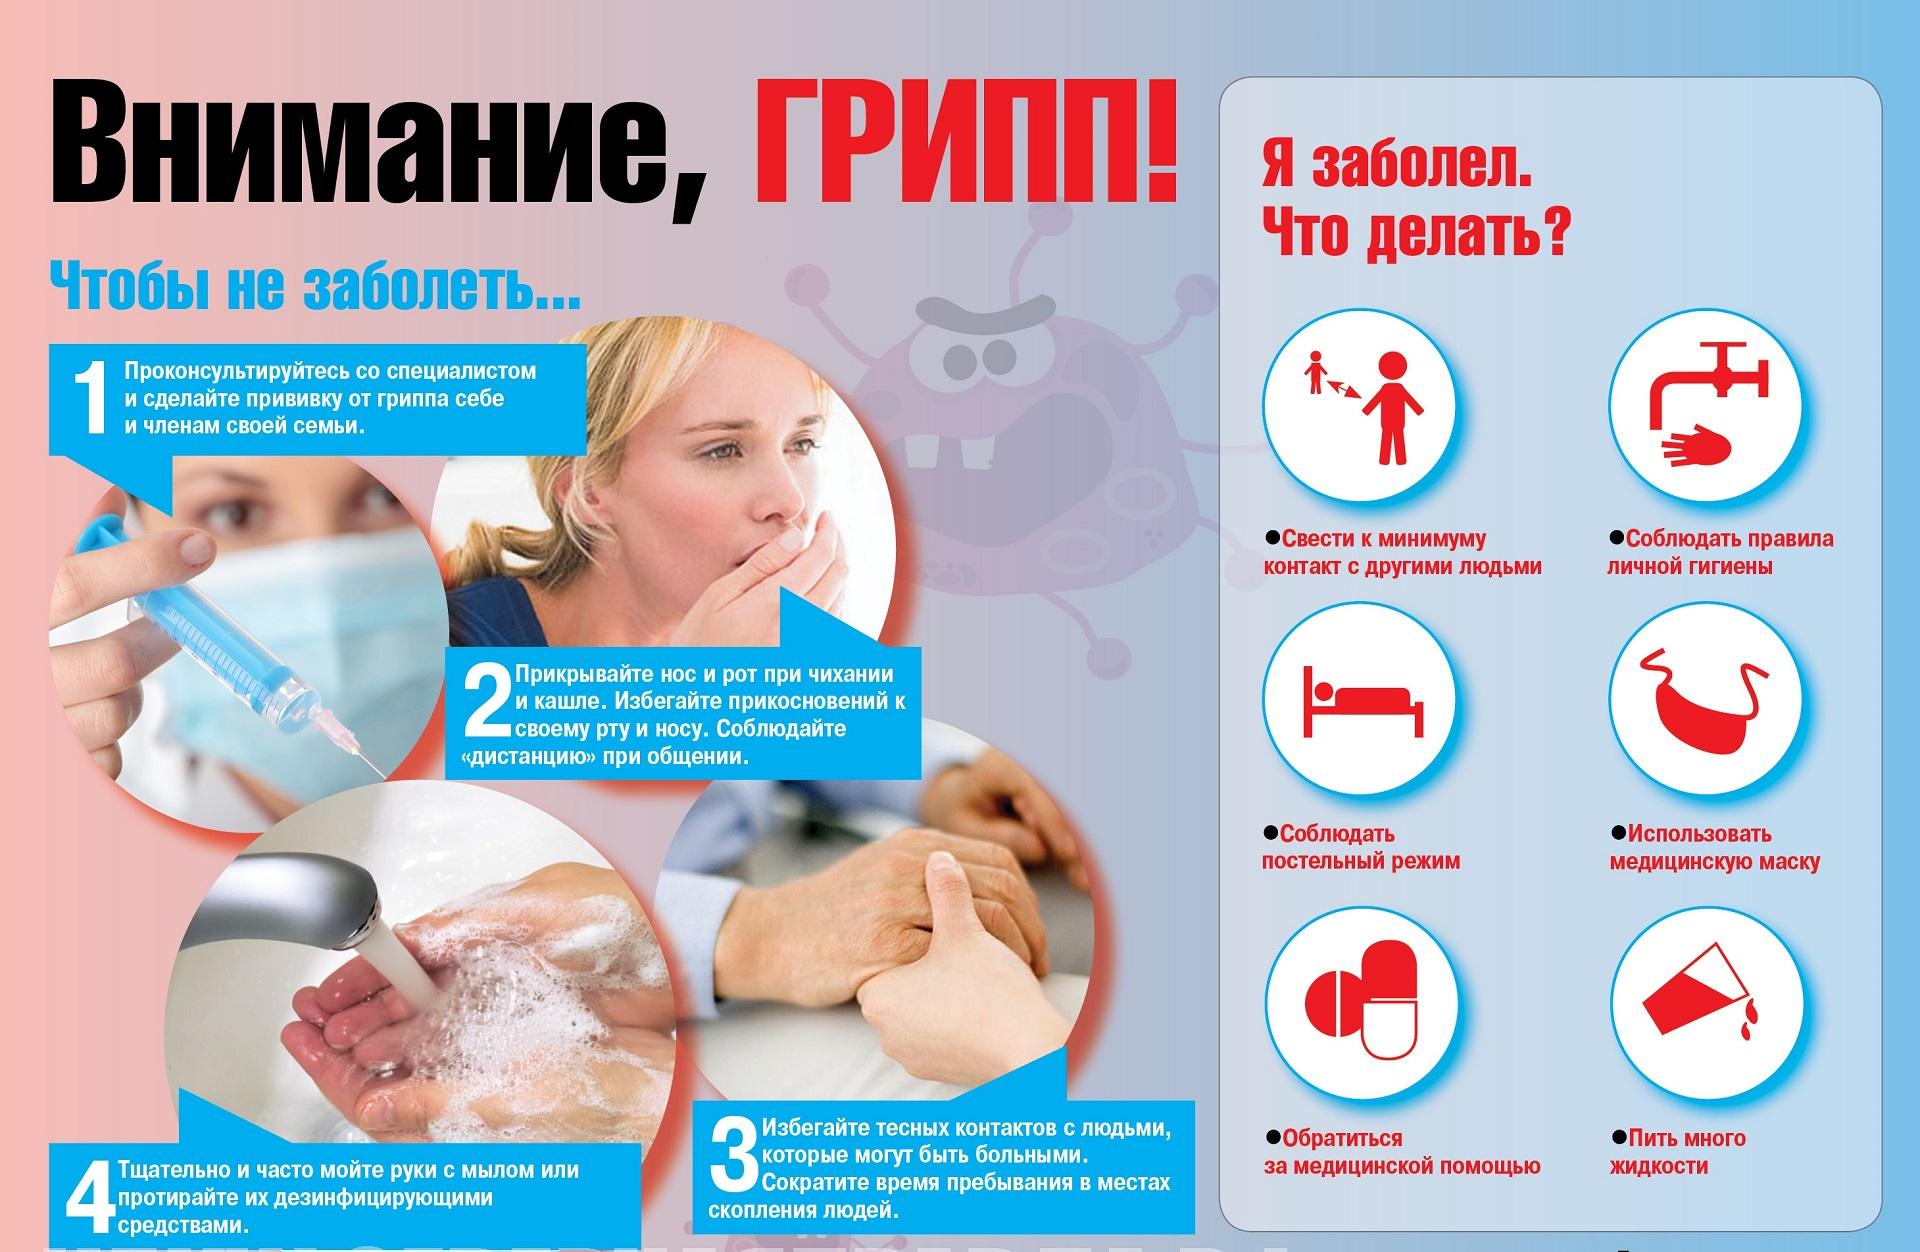 Картинка меры профилактики гриппа